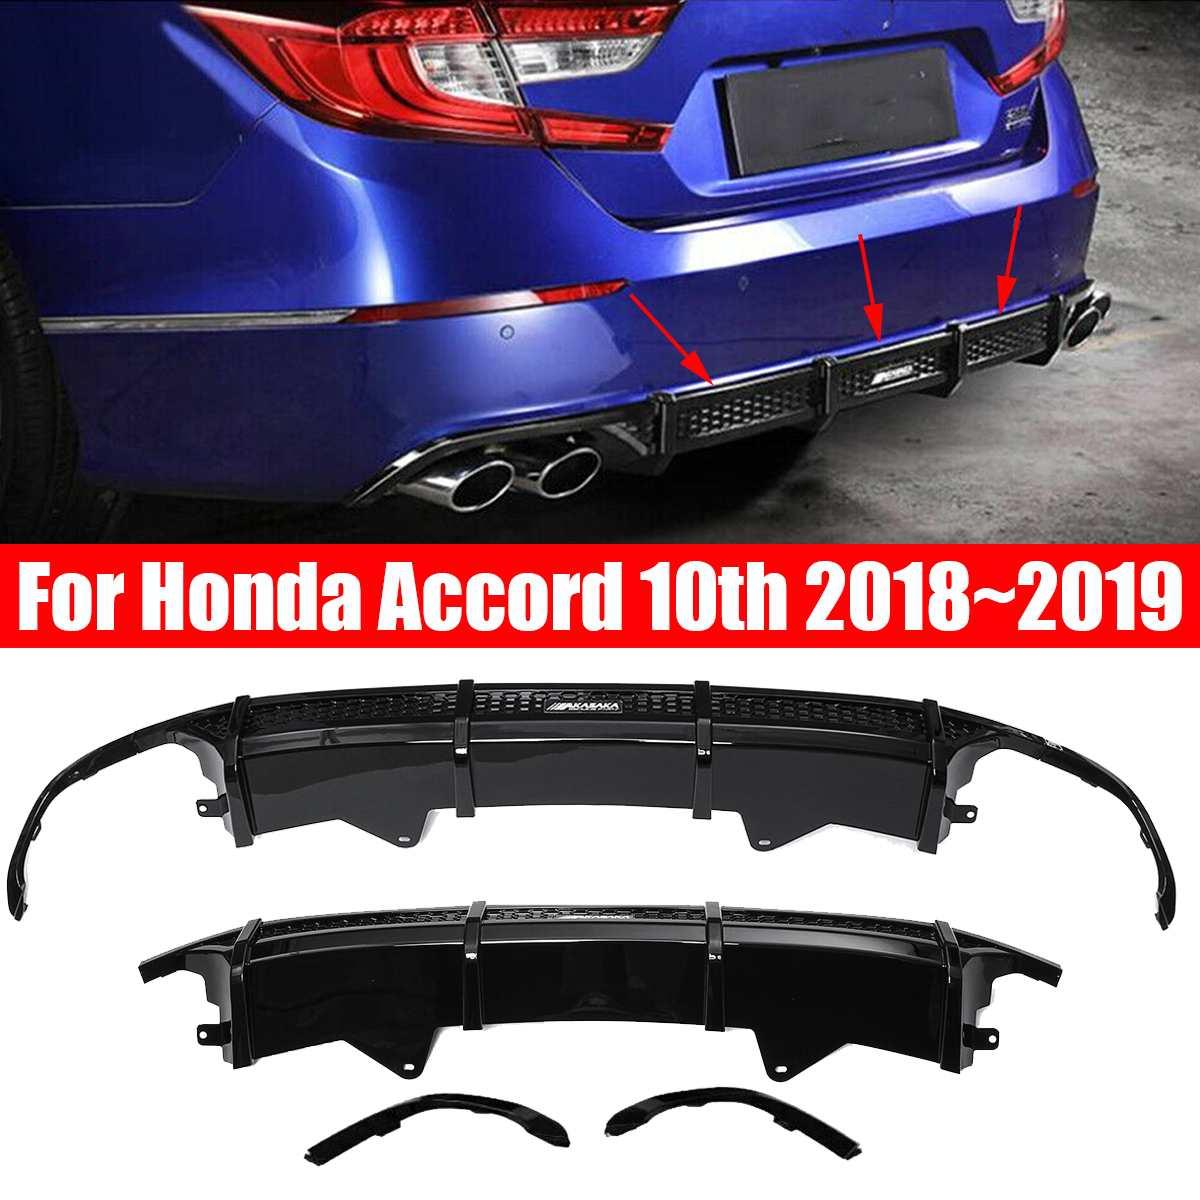 3Pcs Black Rear Bumper Diffuser Body Kit Lip Cover Trim For Honda for Accord 2018~2019 Auto Exterior Part Bumper Skirt Spoiler